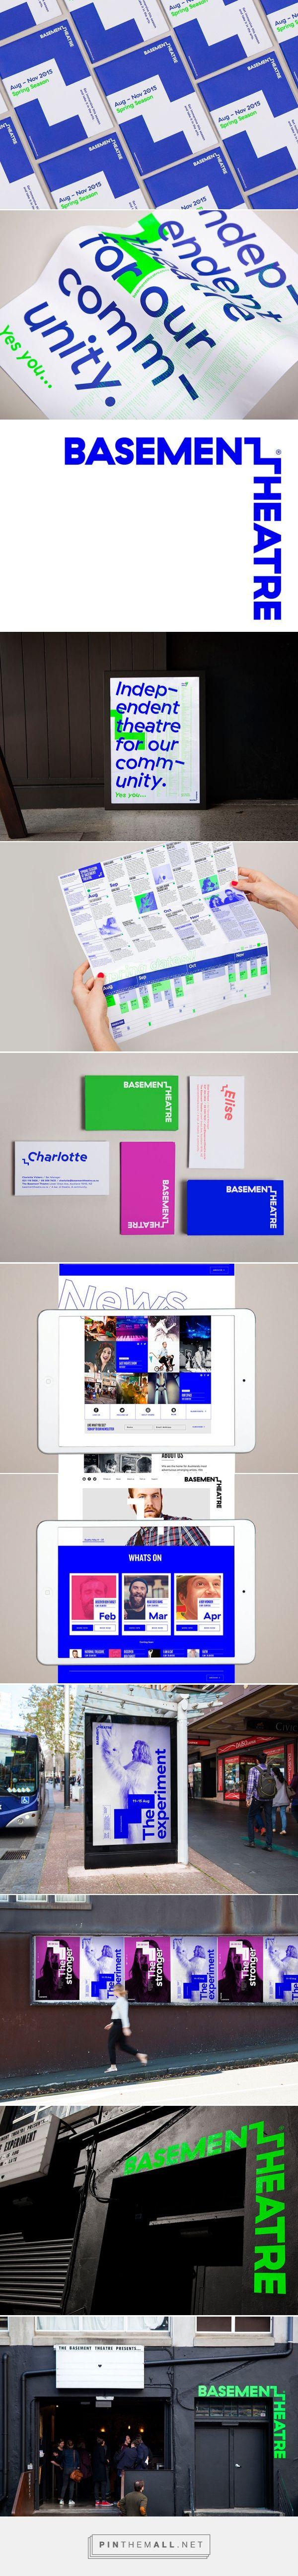 Basement Theatre | Identity Designed - created via http://pinthemall.net